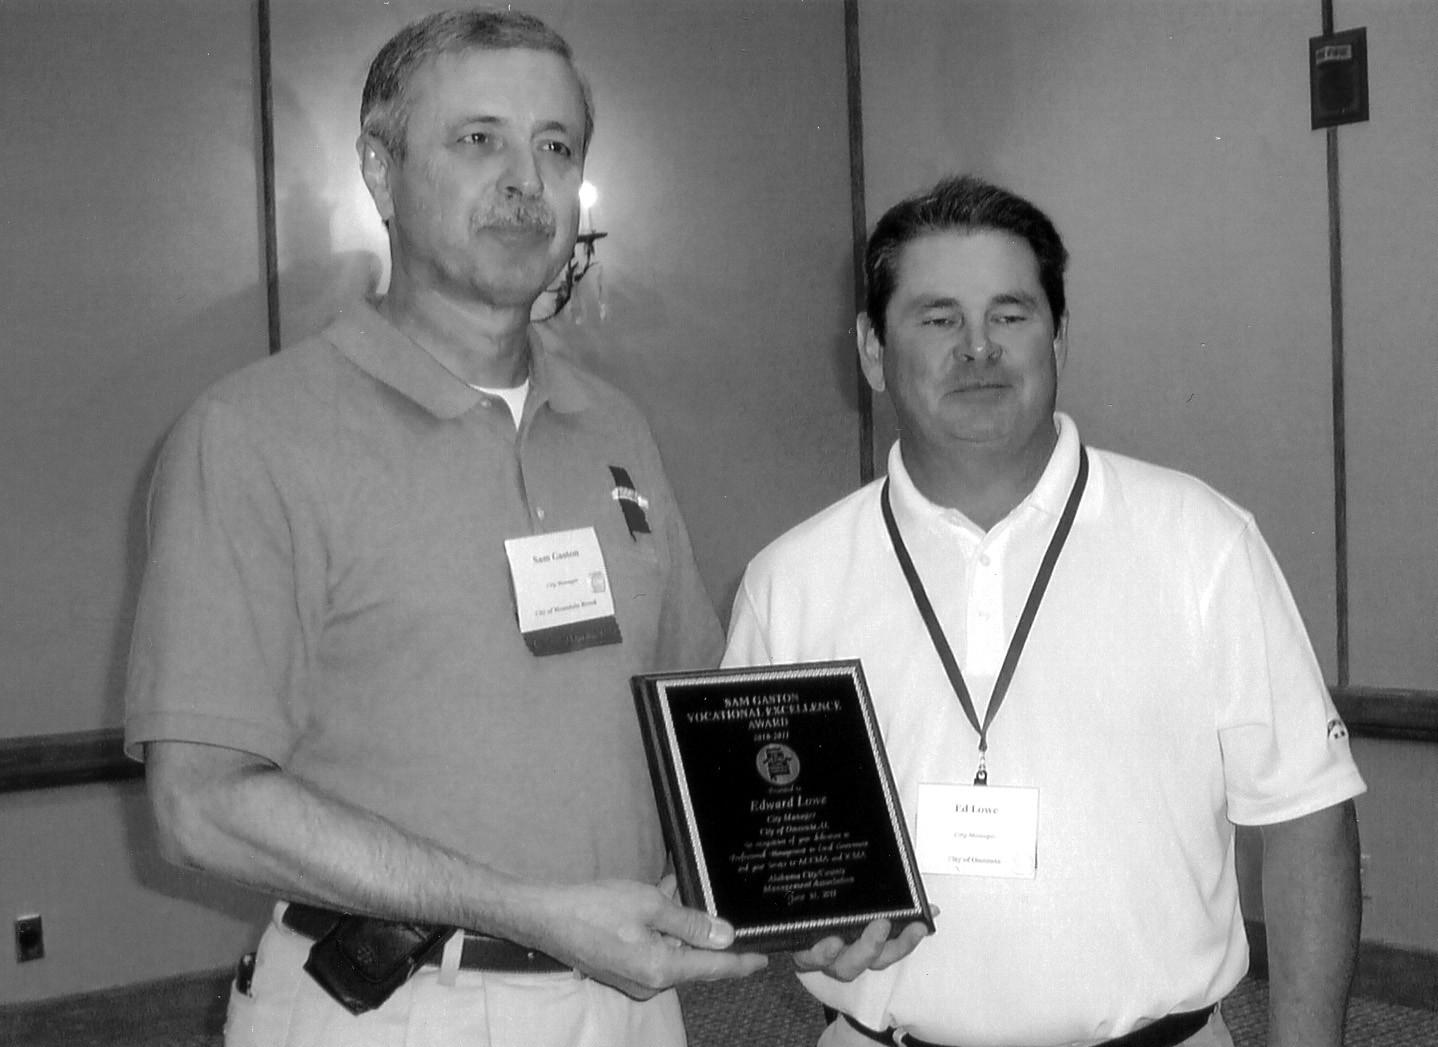 Sam Gaston (left) presents award to Ed Lowe.